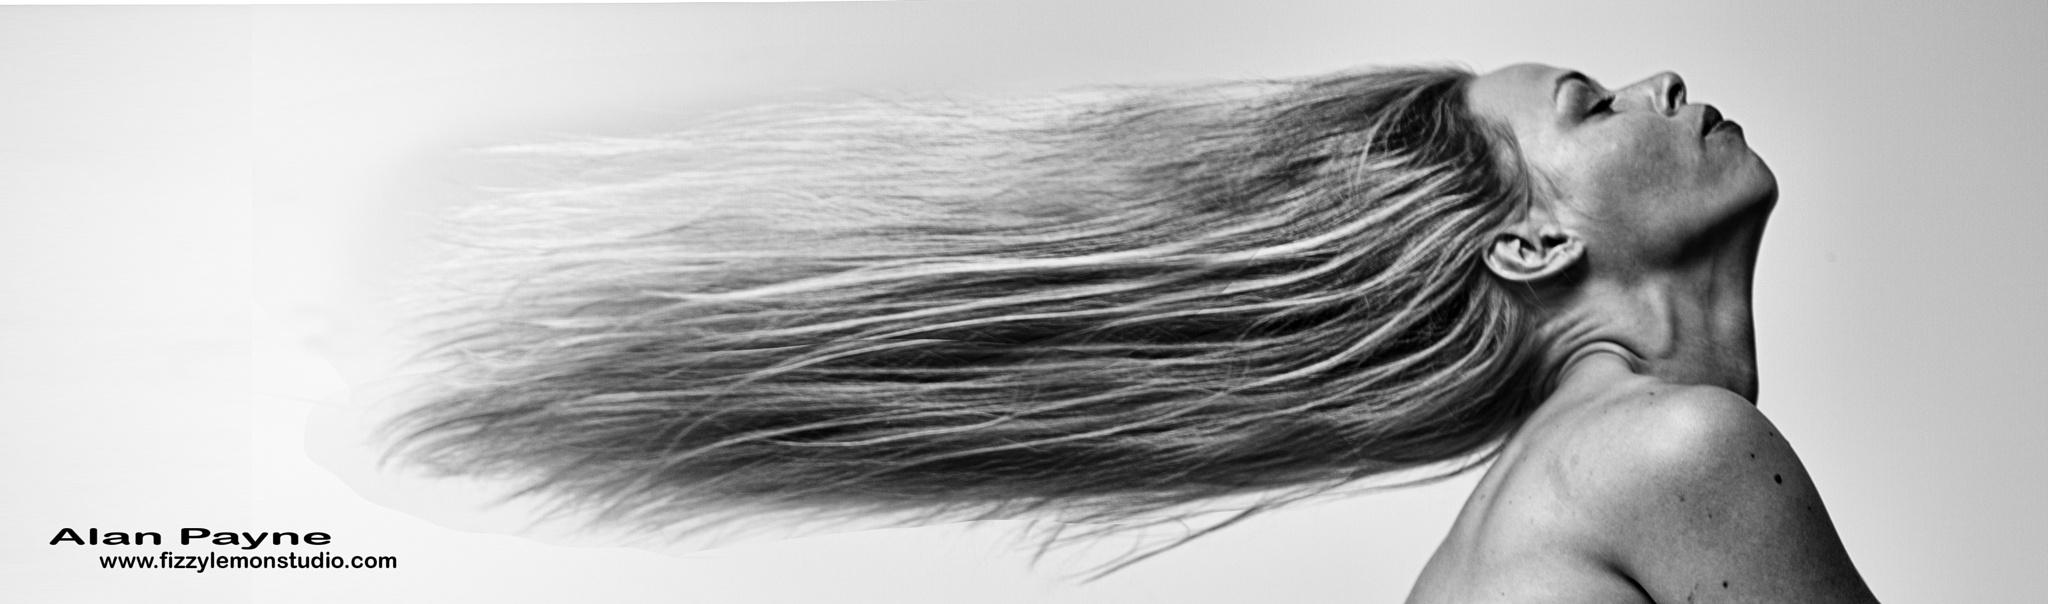 In the wind by alanpayne_fizzylemonstudio